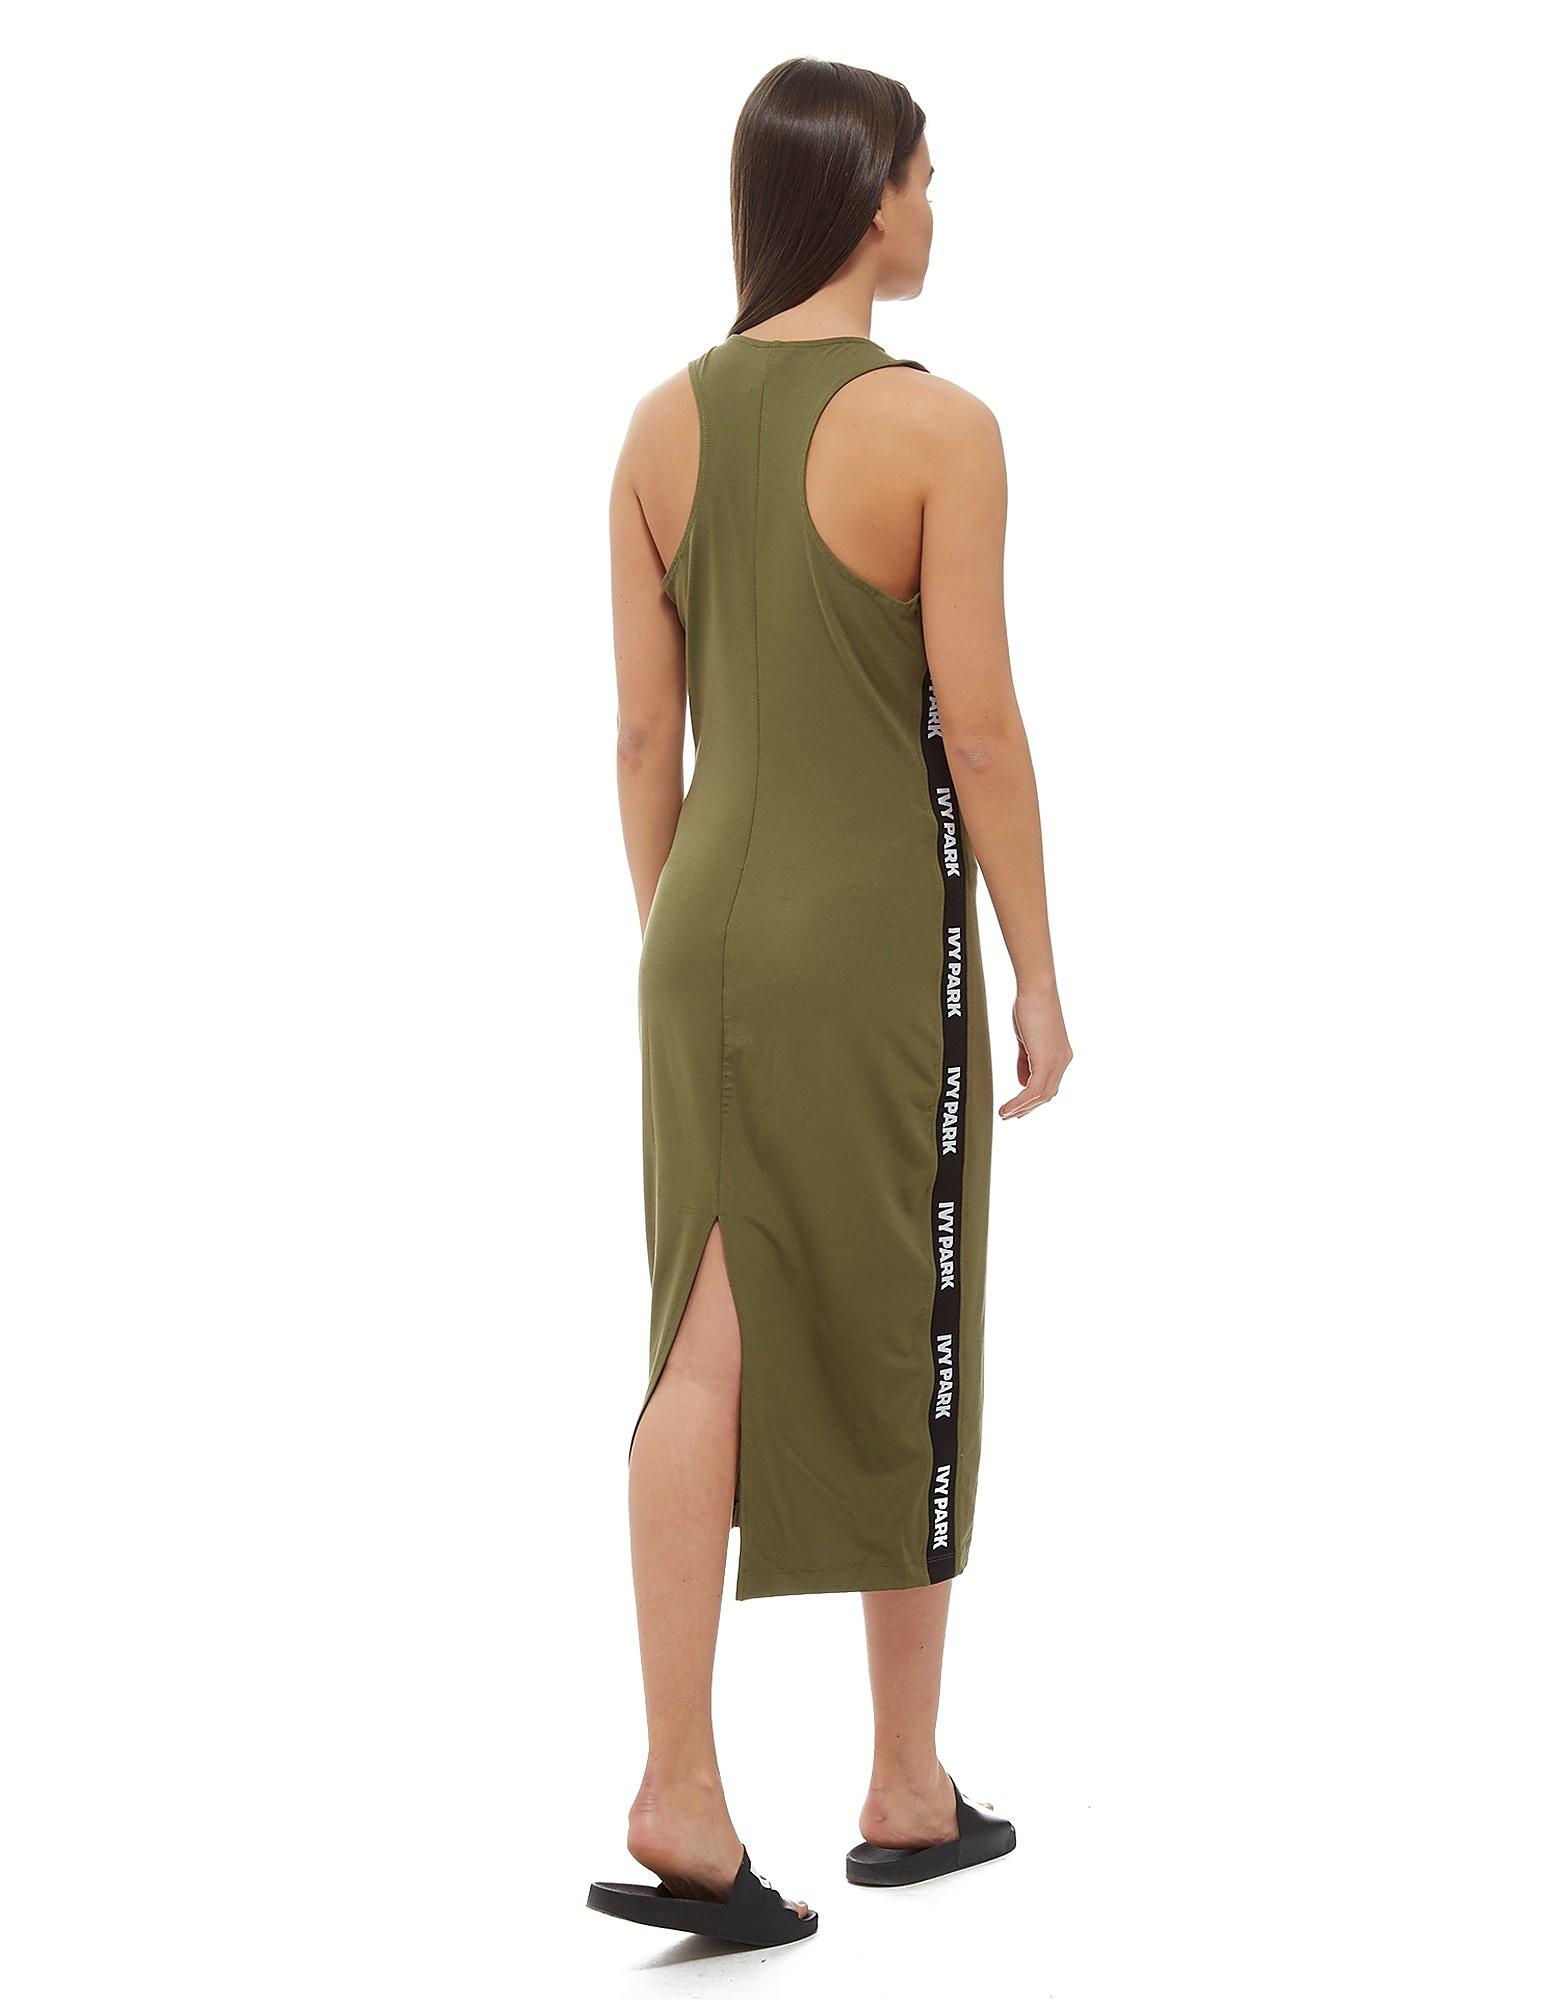 IVY PARK Logo Tape Dress